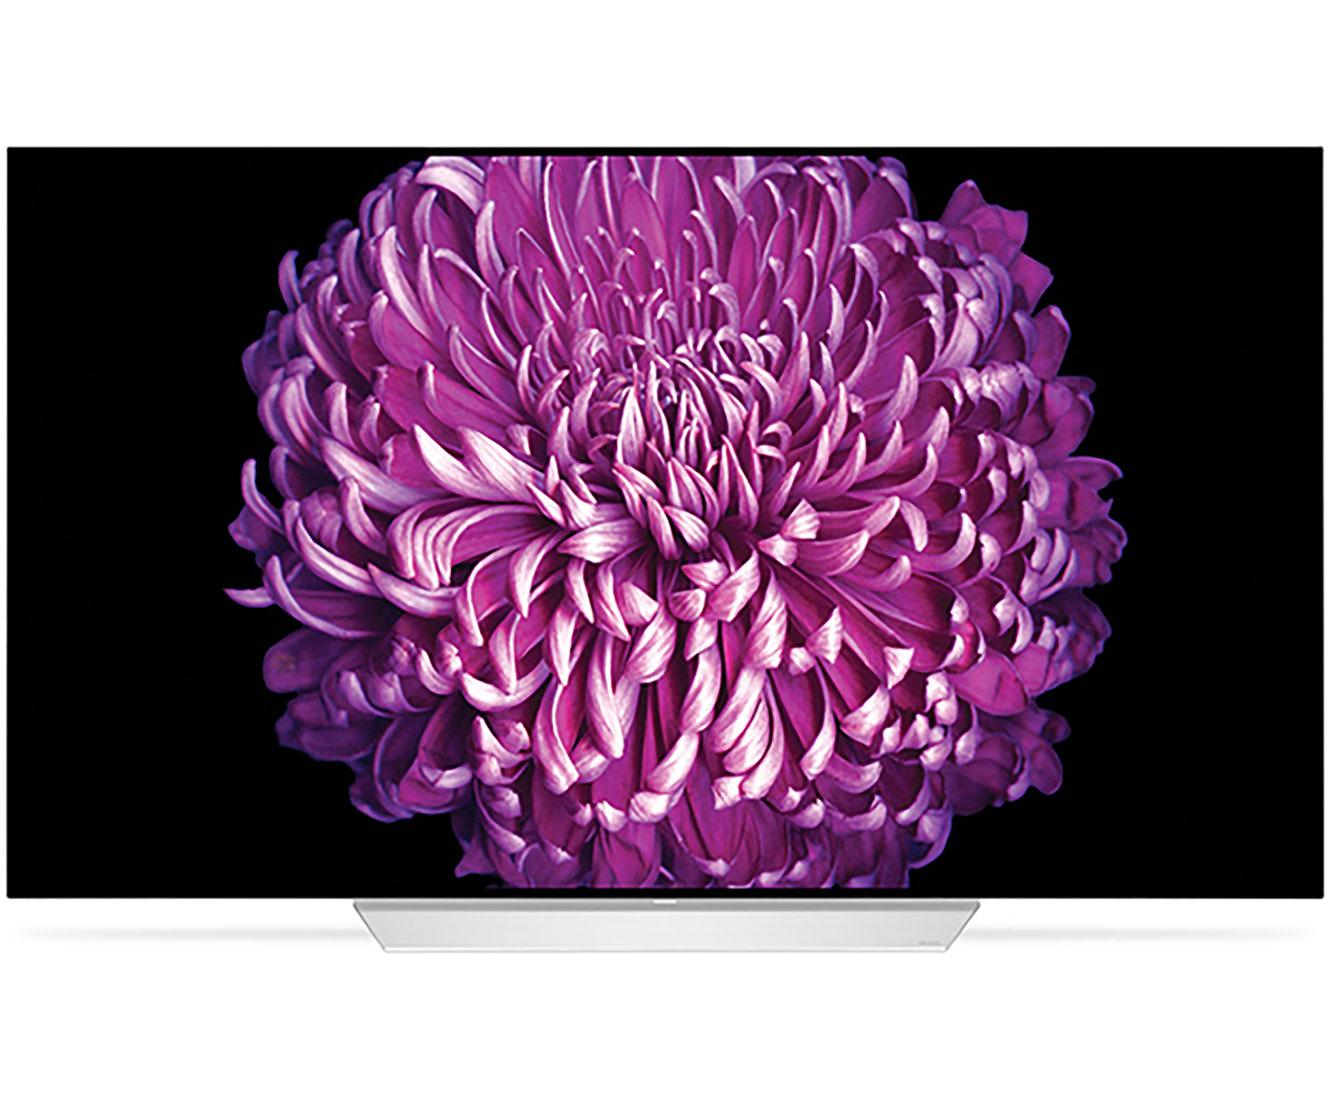 LG OLED 65C7 4k UHD TV